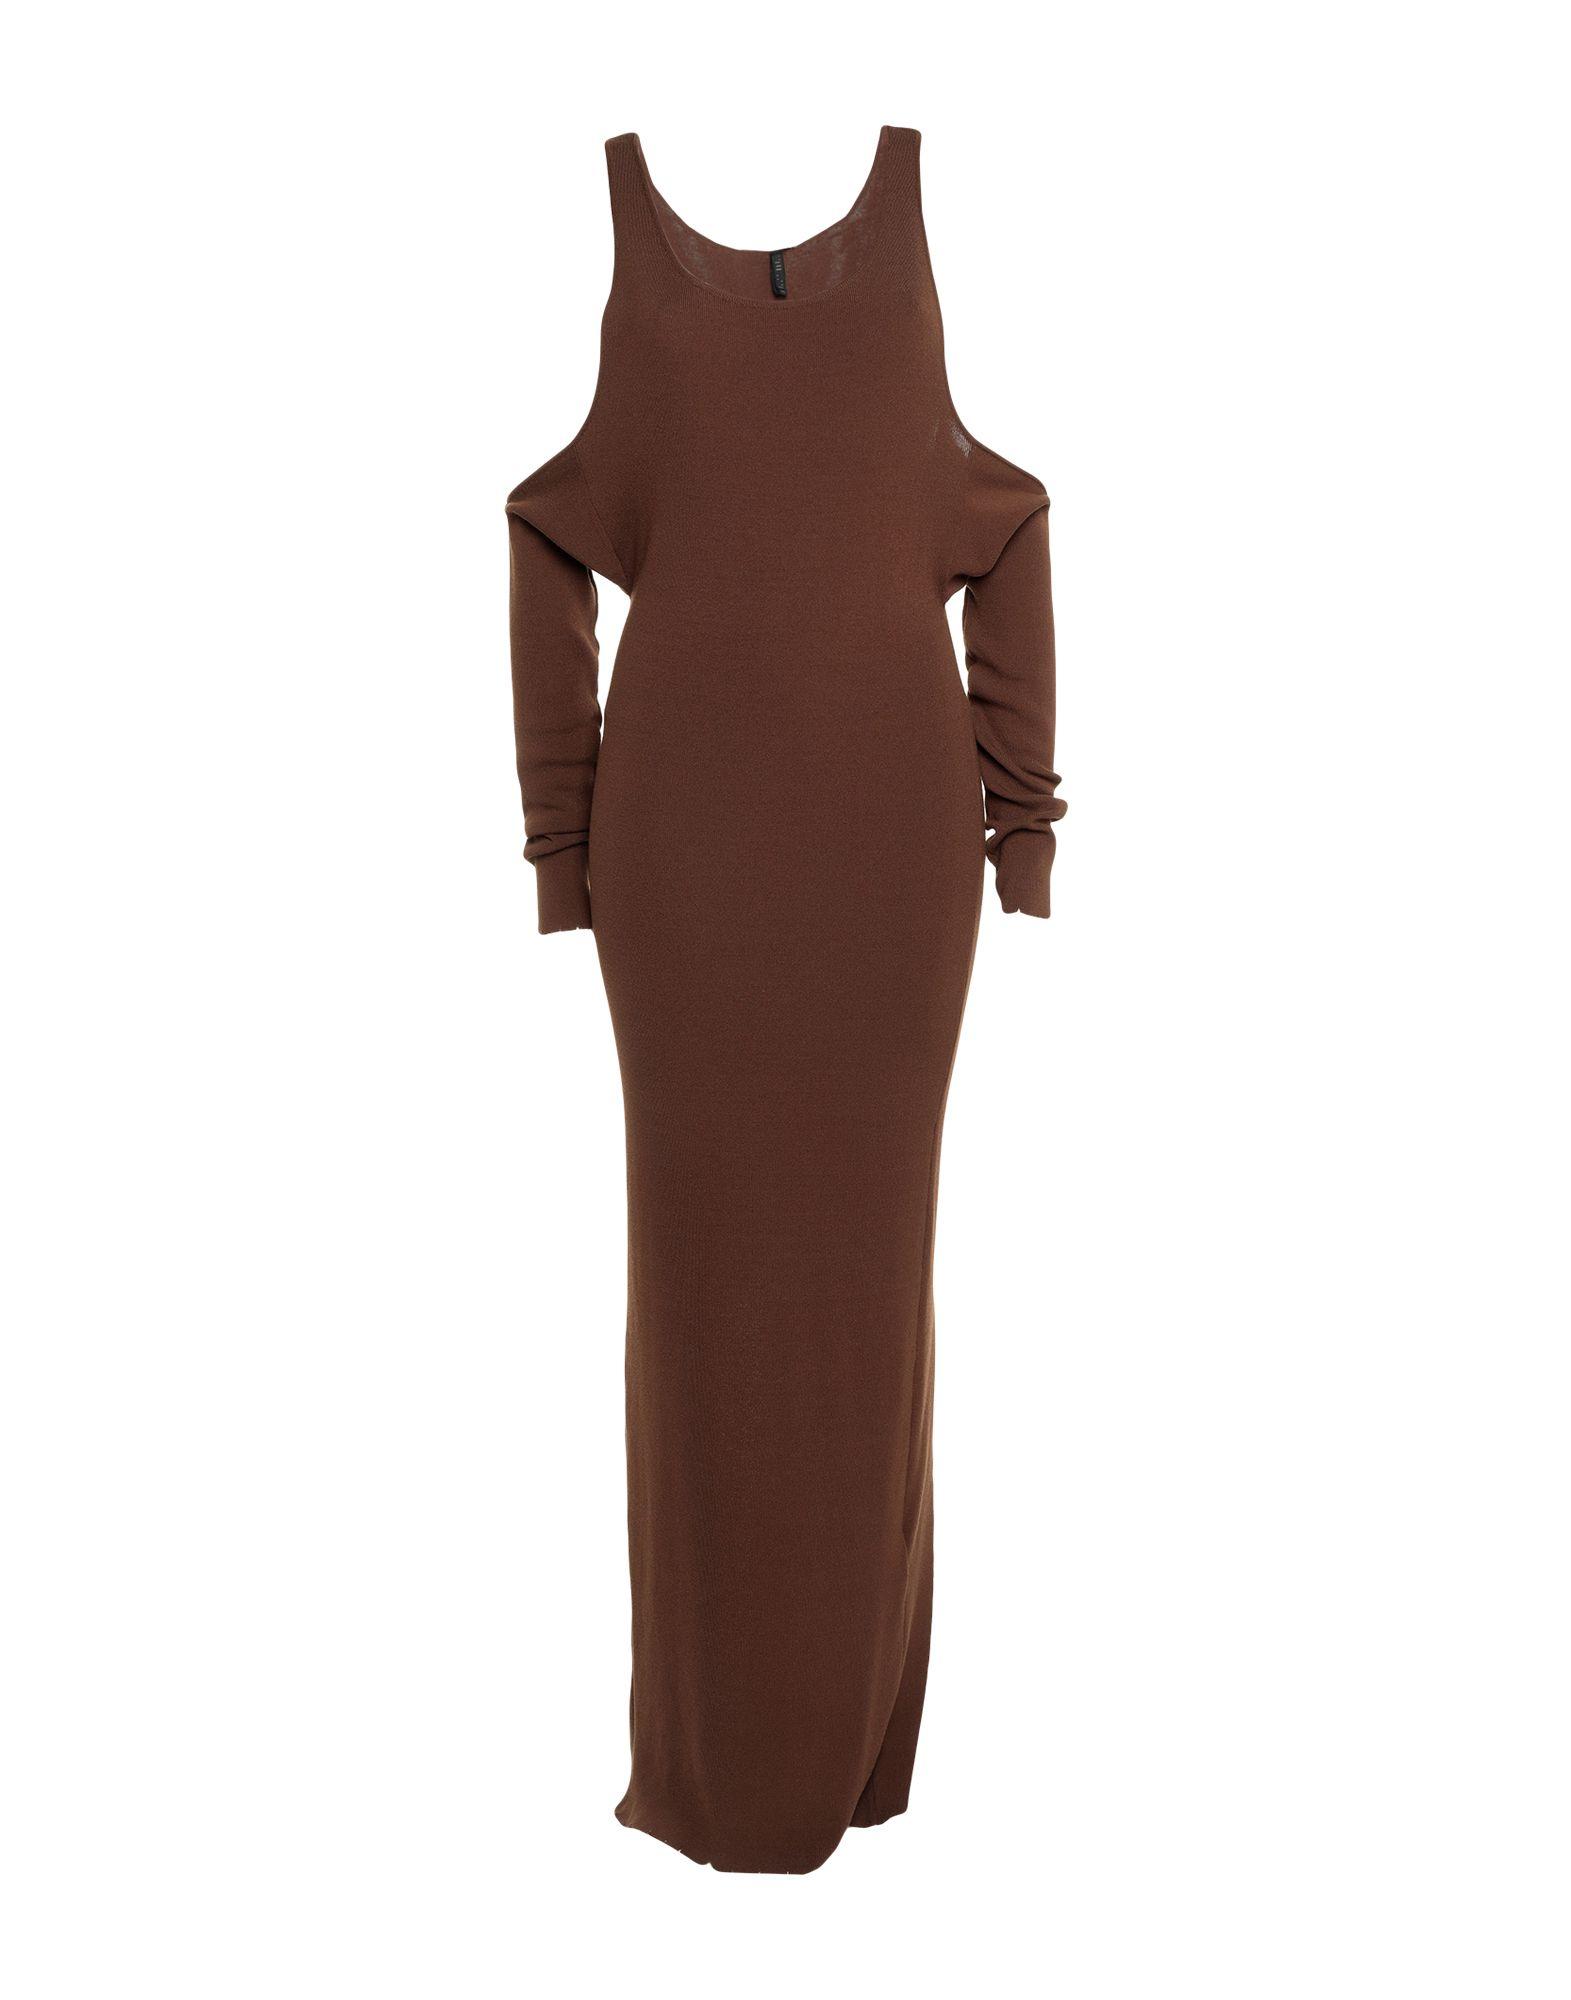 BEN TAVERNITI™ UNRAVEL PROJECT Длинное платье